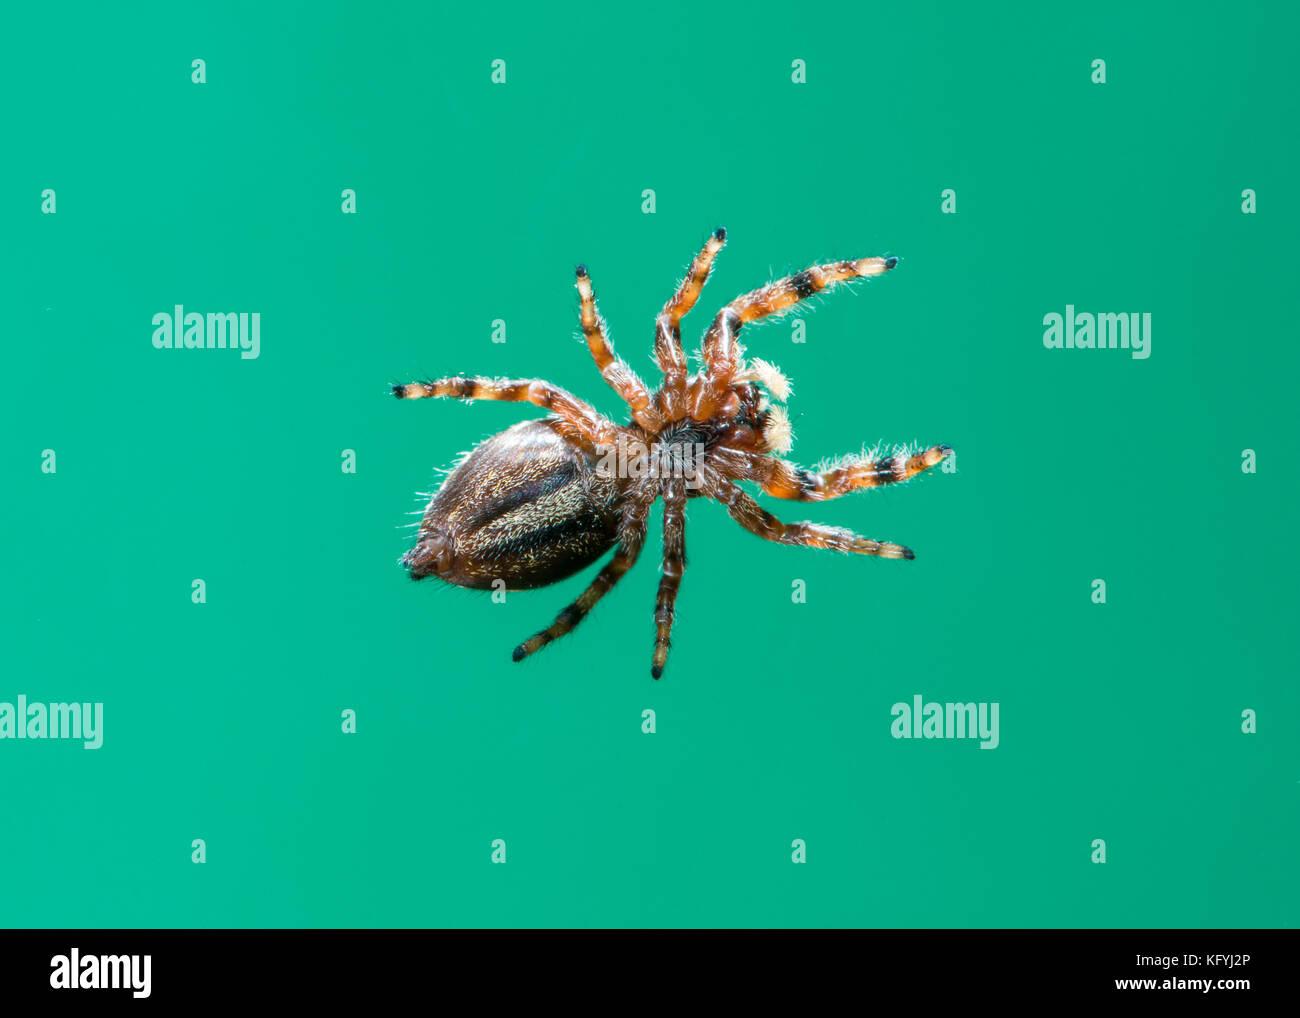 Kansas City, Kansas.  Bottom view of Brilliant Jumper spider; Phidippus clarus. - Stock Image